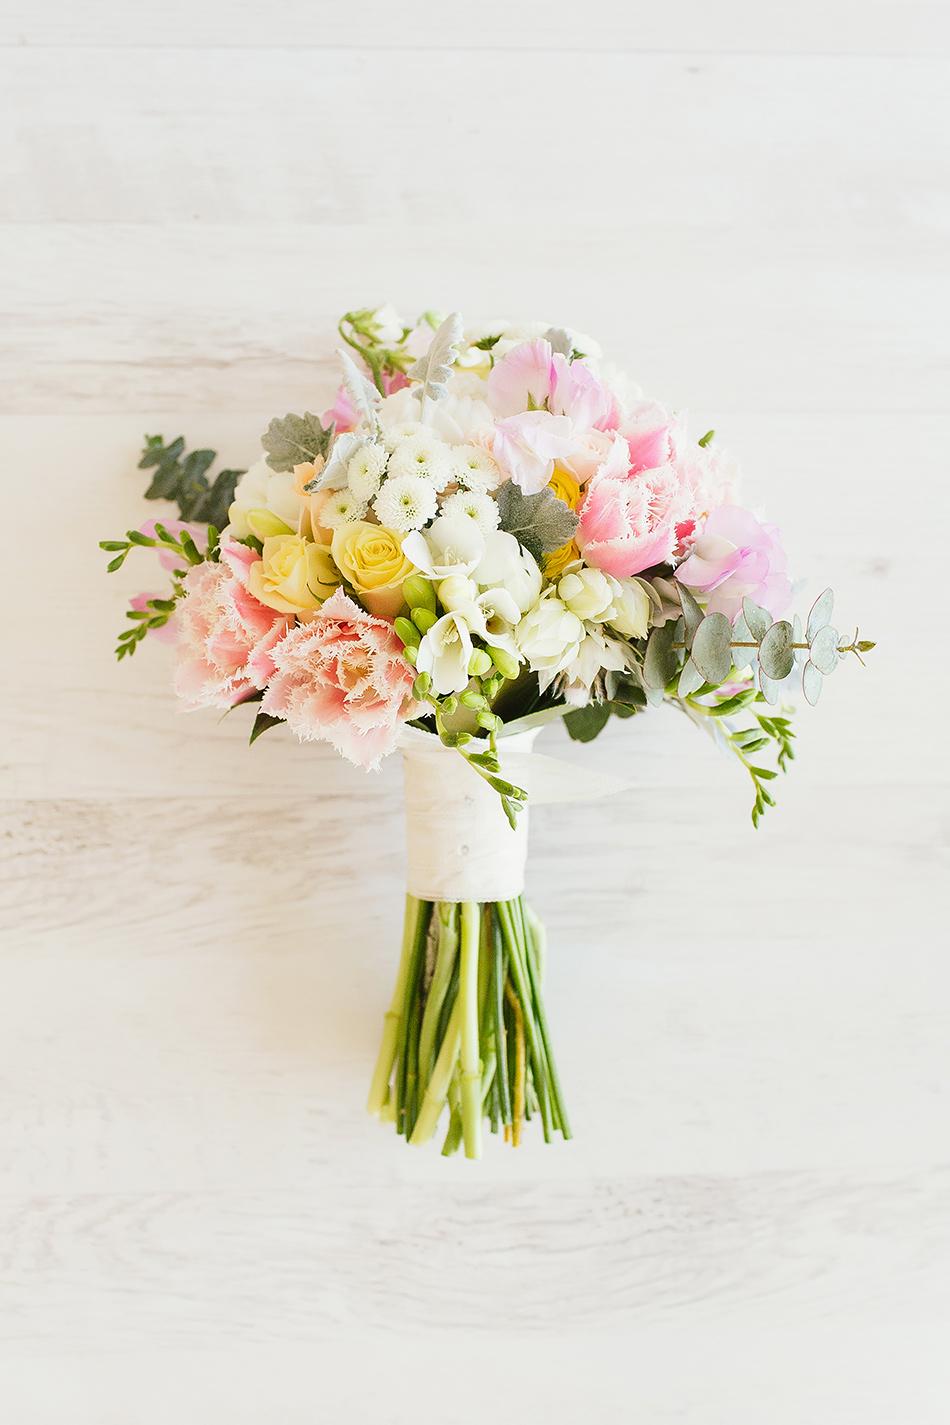 the elandra wedding flowers mission beach pastel beach wedding